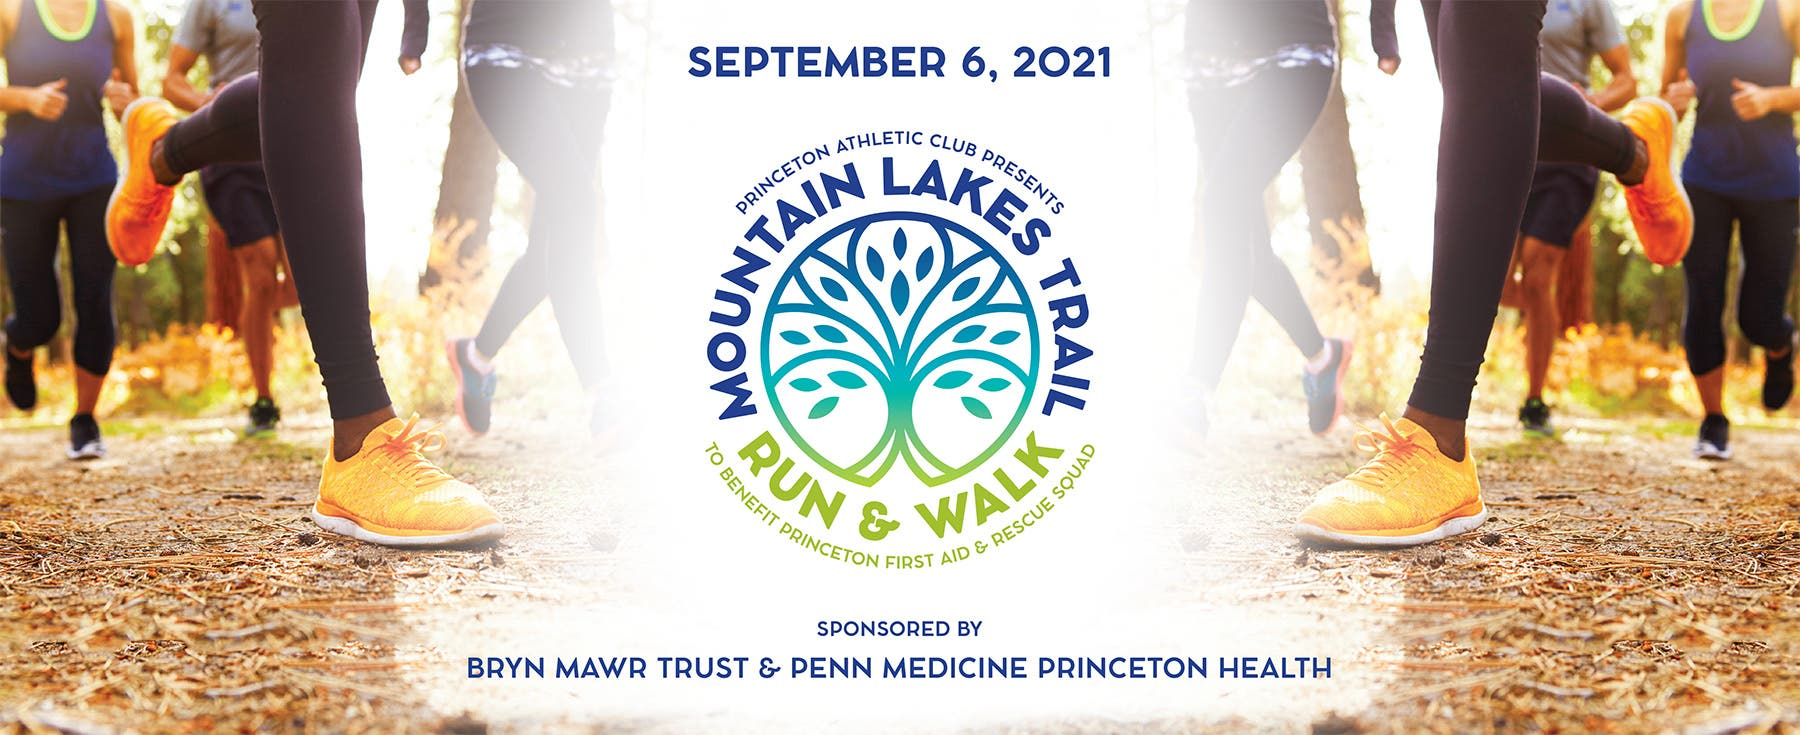 Mountain Lakes 5k Trail Run & Walk to Benefit the Princeton First Aid & Rescue Squad